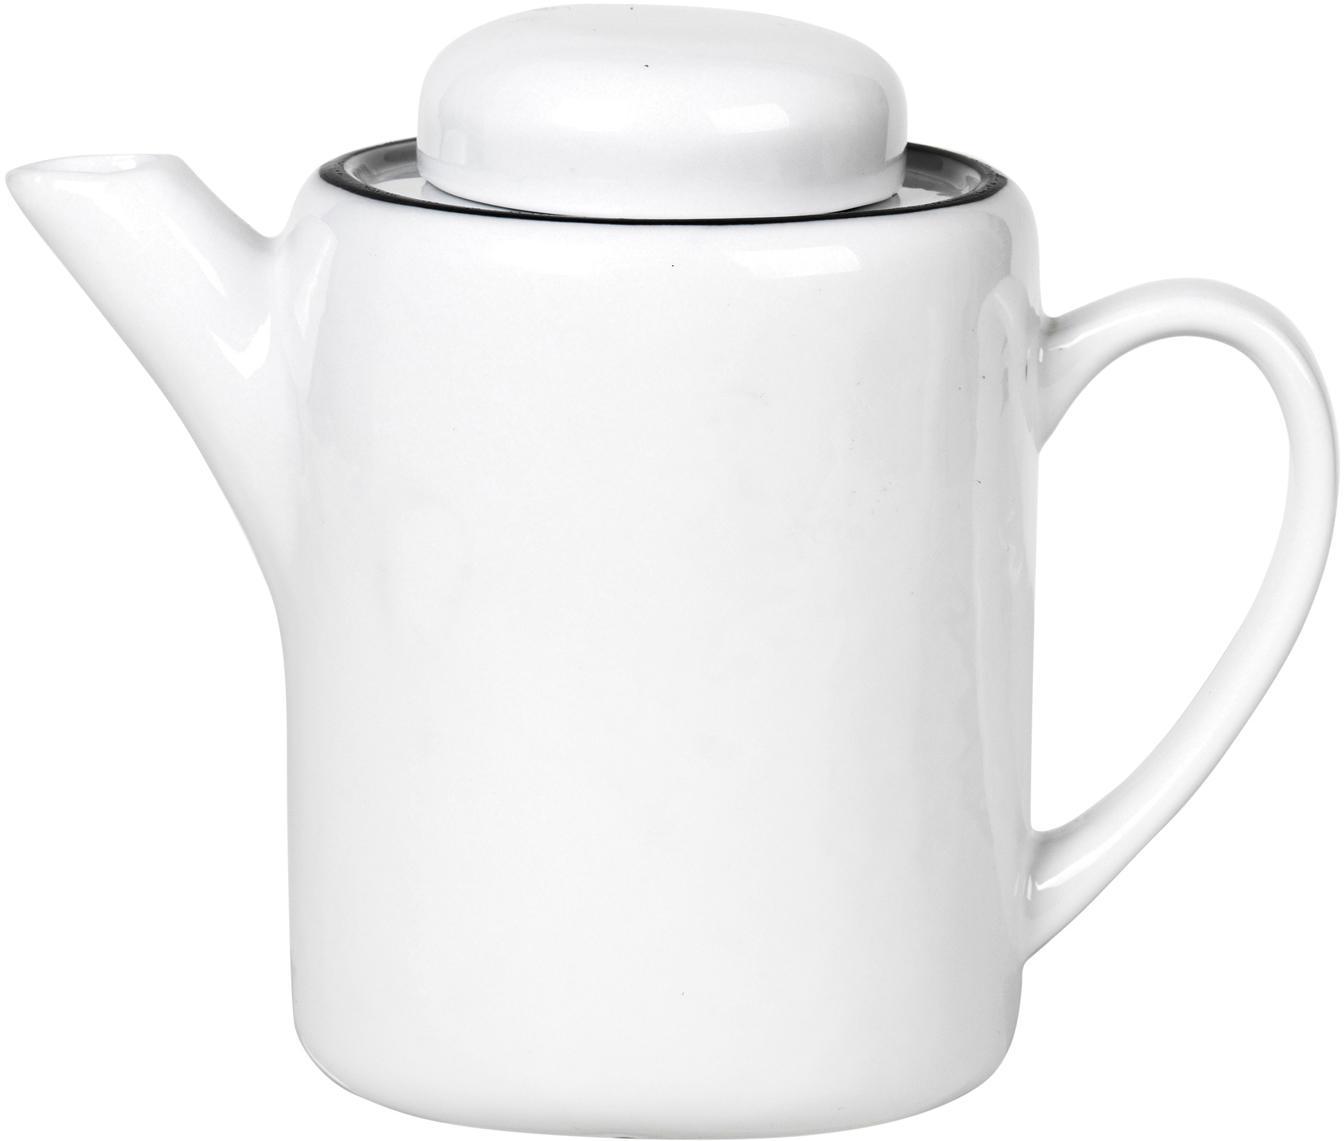 Tetera artesanal Salt, Porcelana, Blanco crudo, negro, 1.3 L